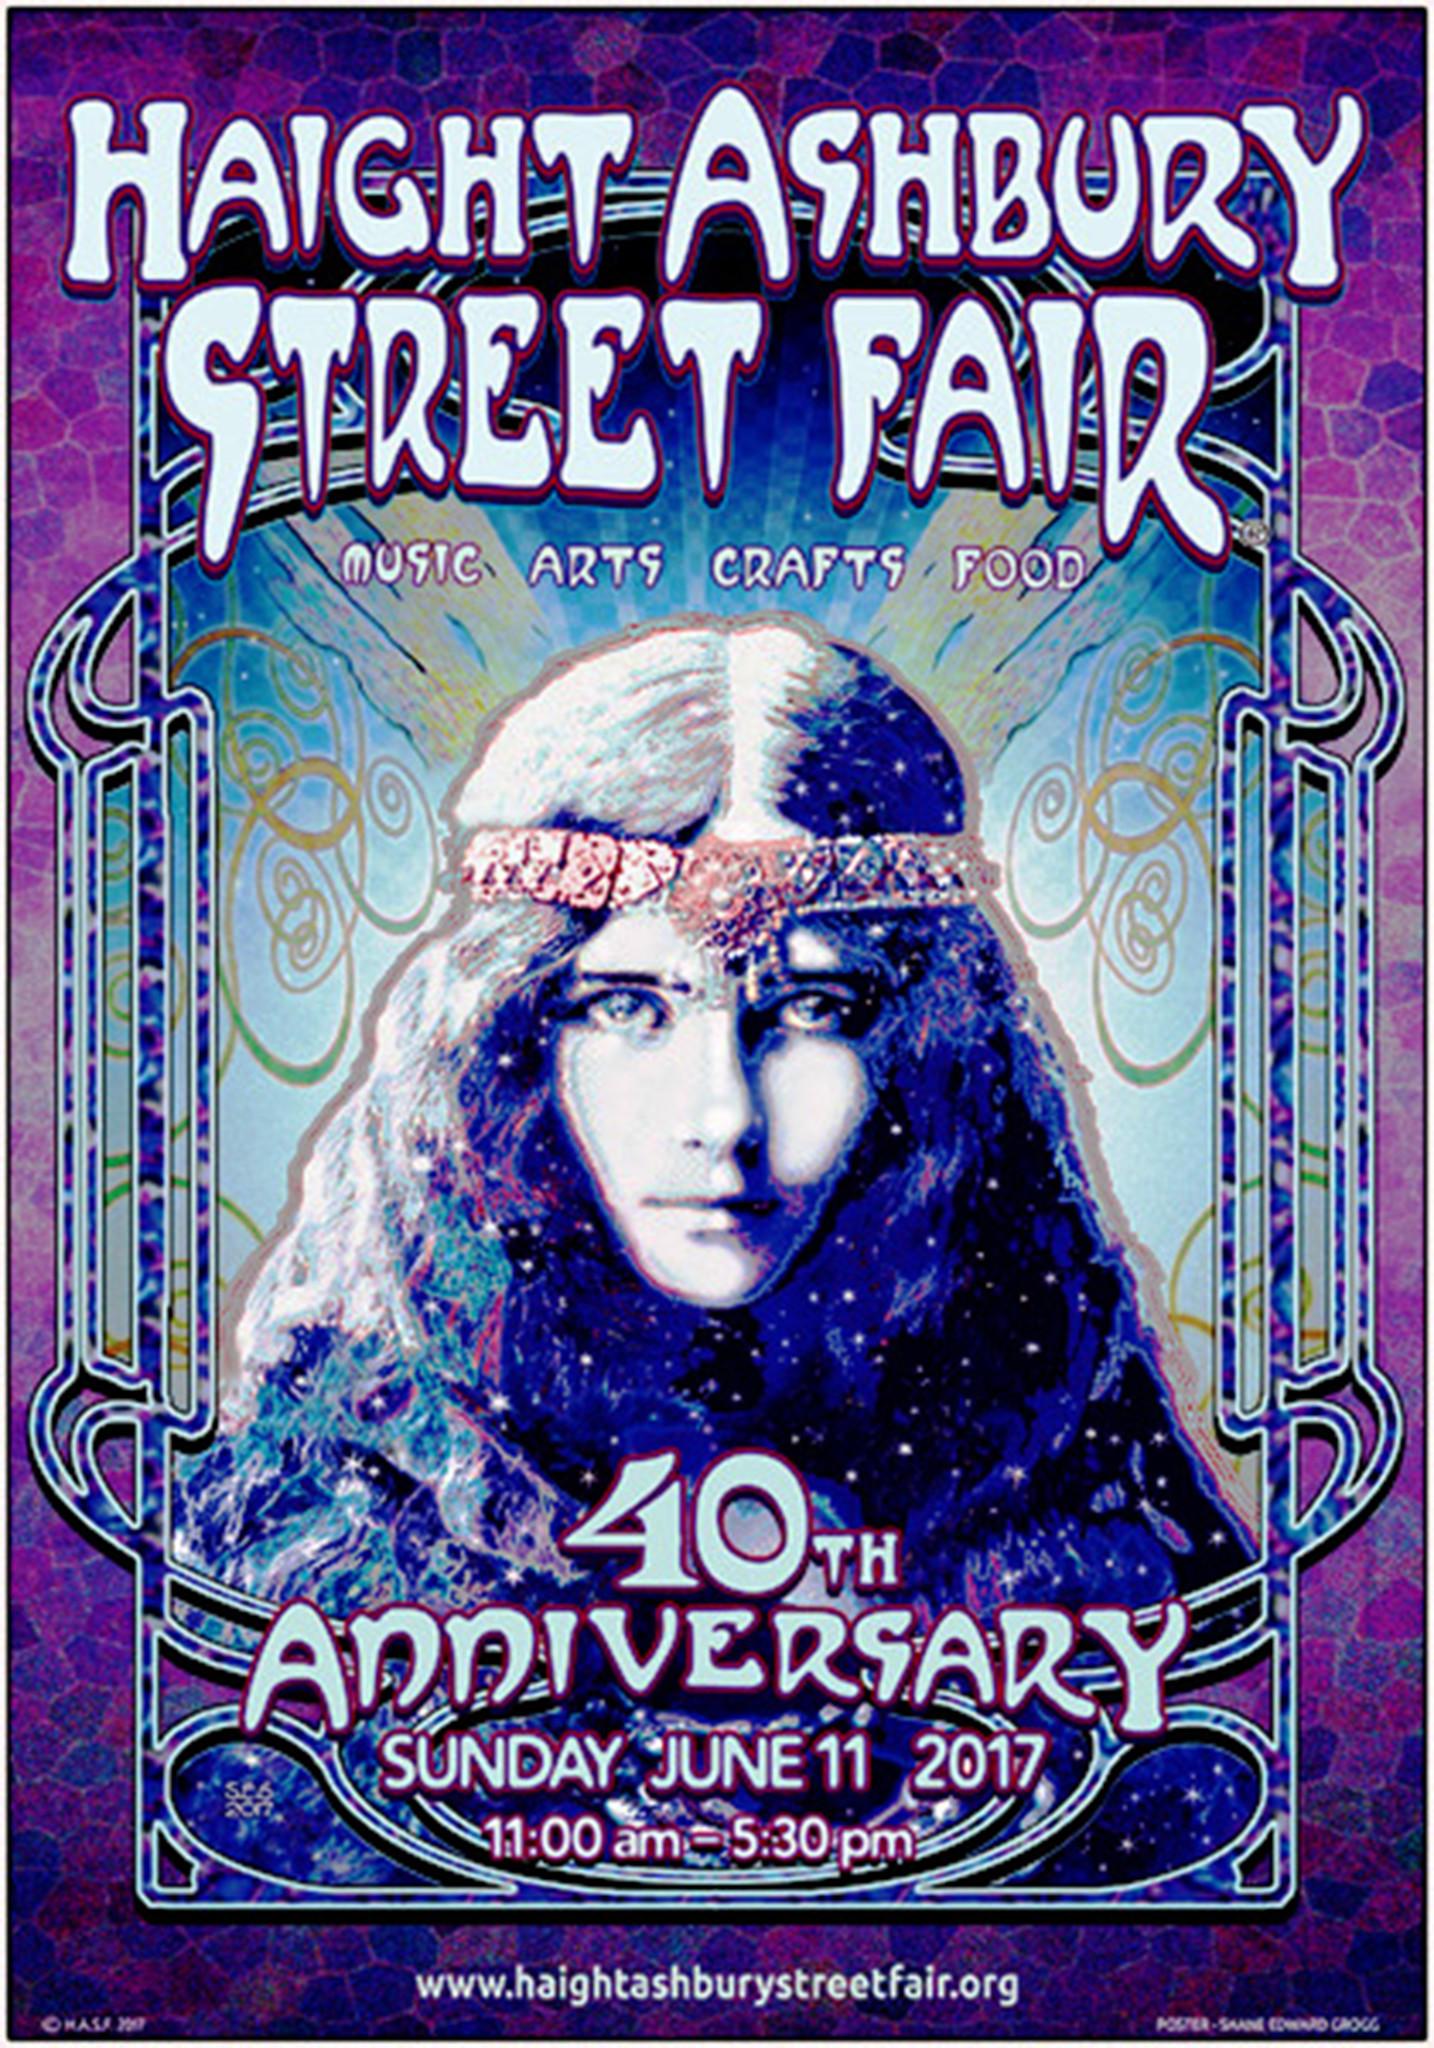 Haight Ashbury Street Fair 40th anniversary poster by Shane Edward Grogg.